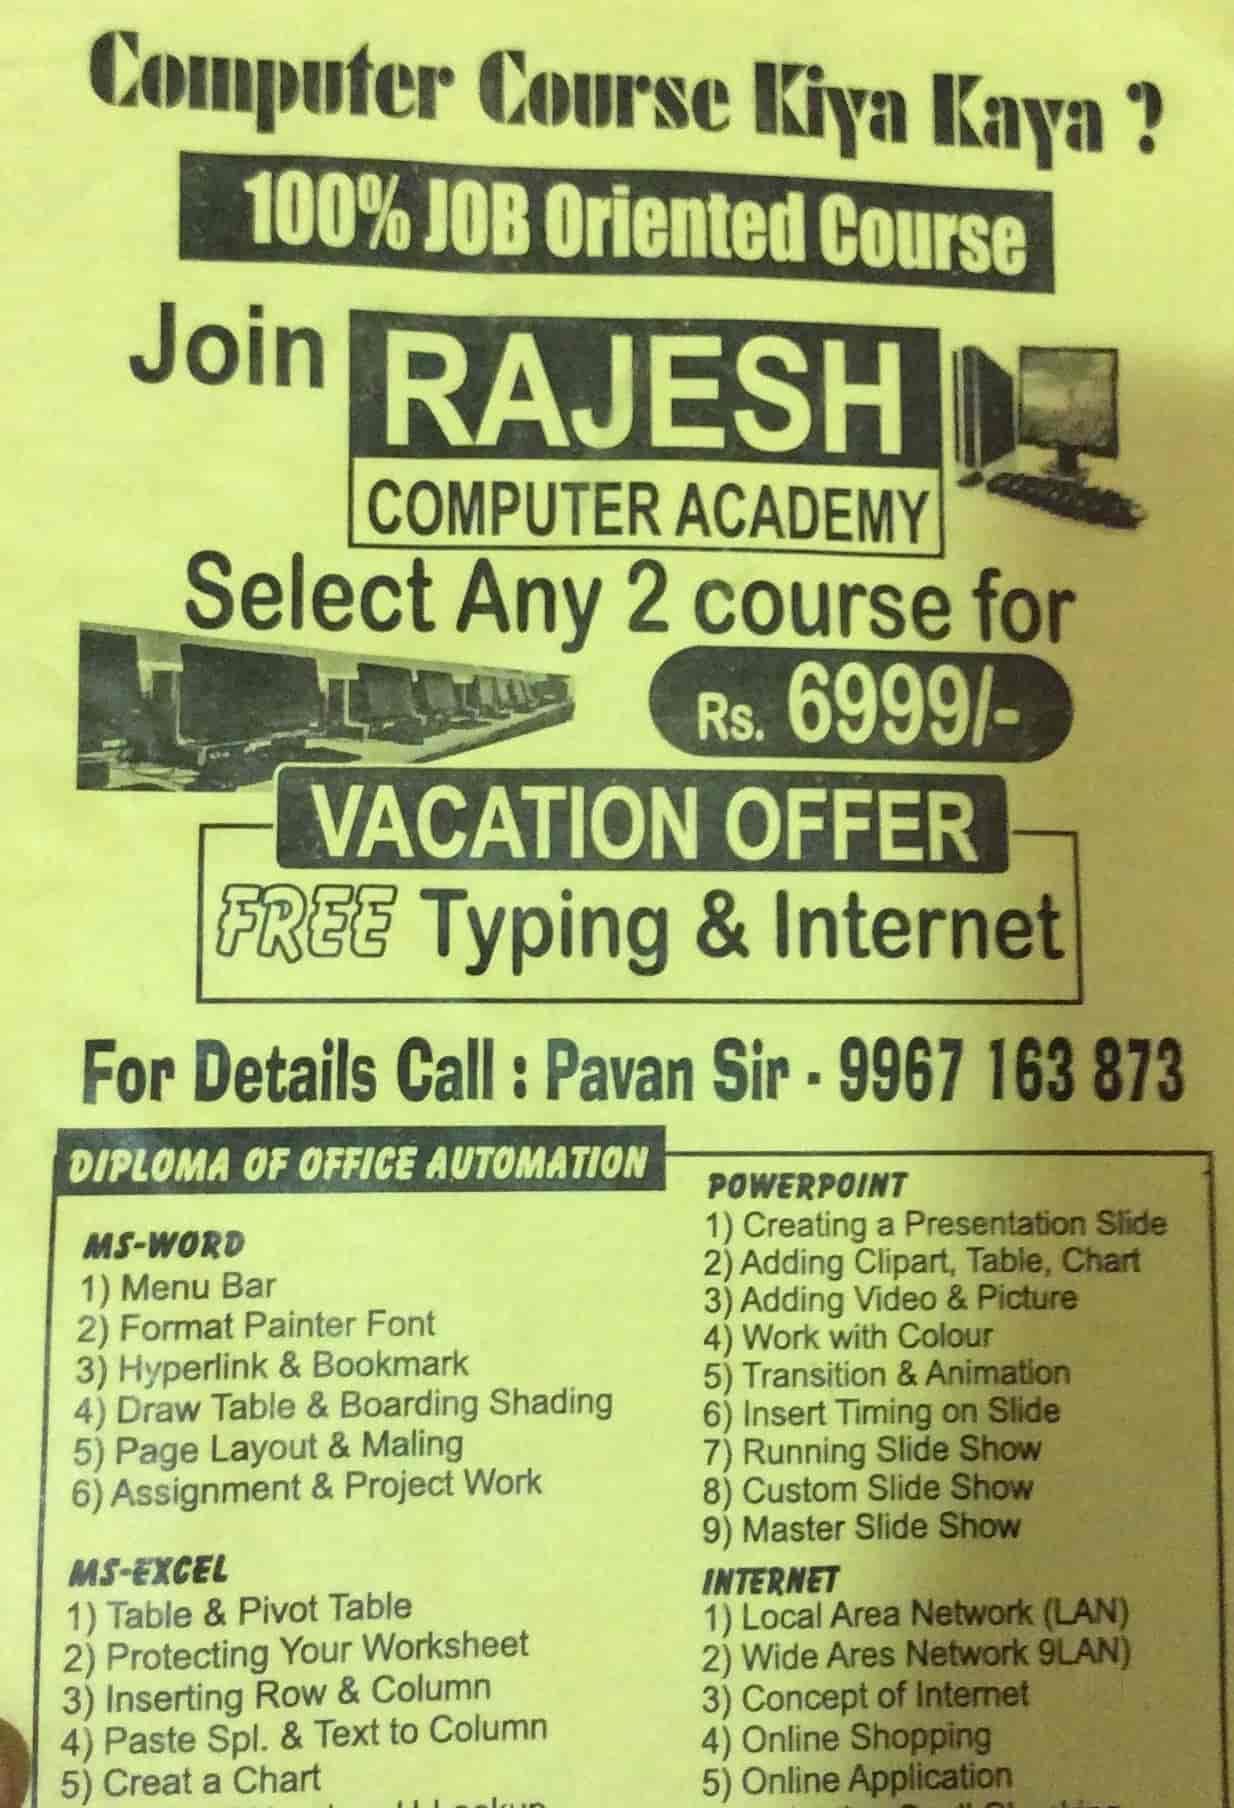 Rajesh Computer Academy, Goregaon West - Computer Training